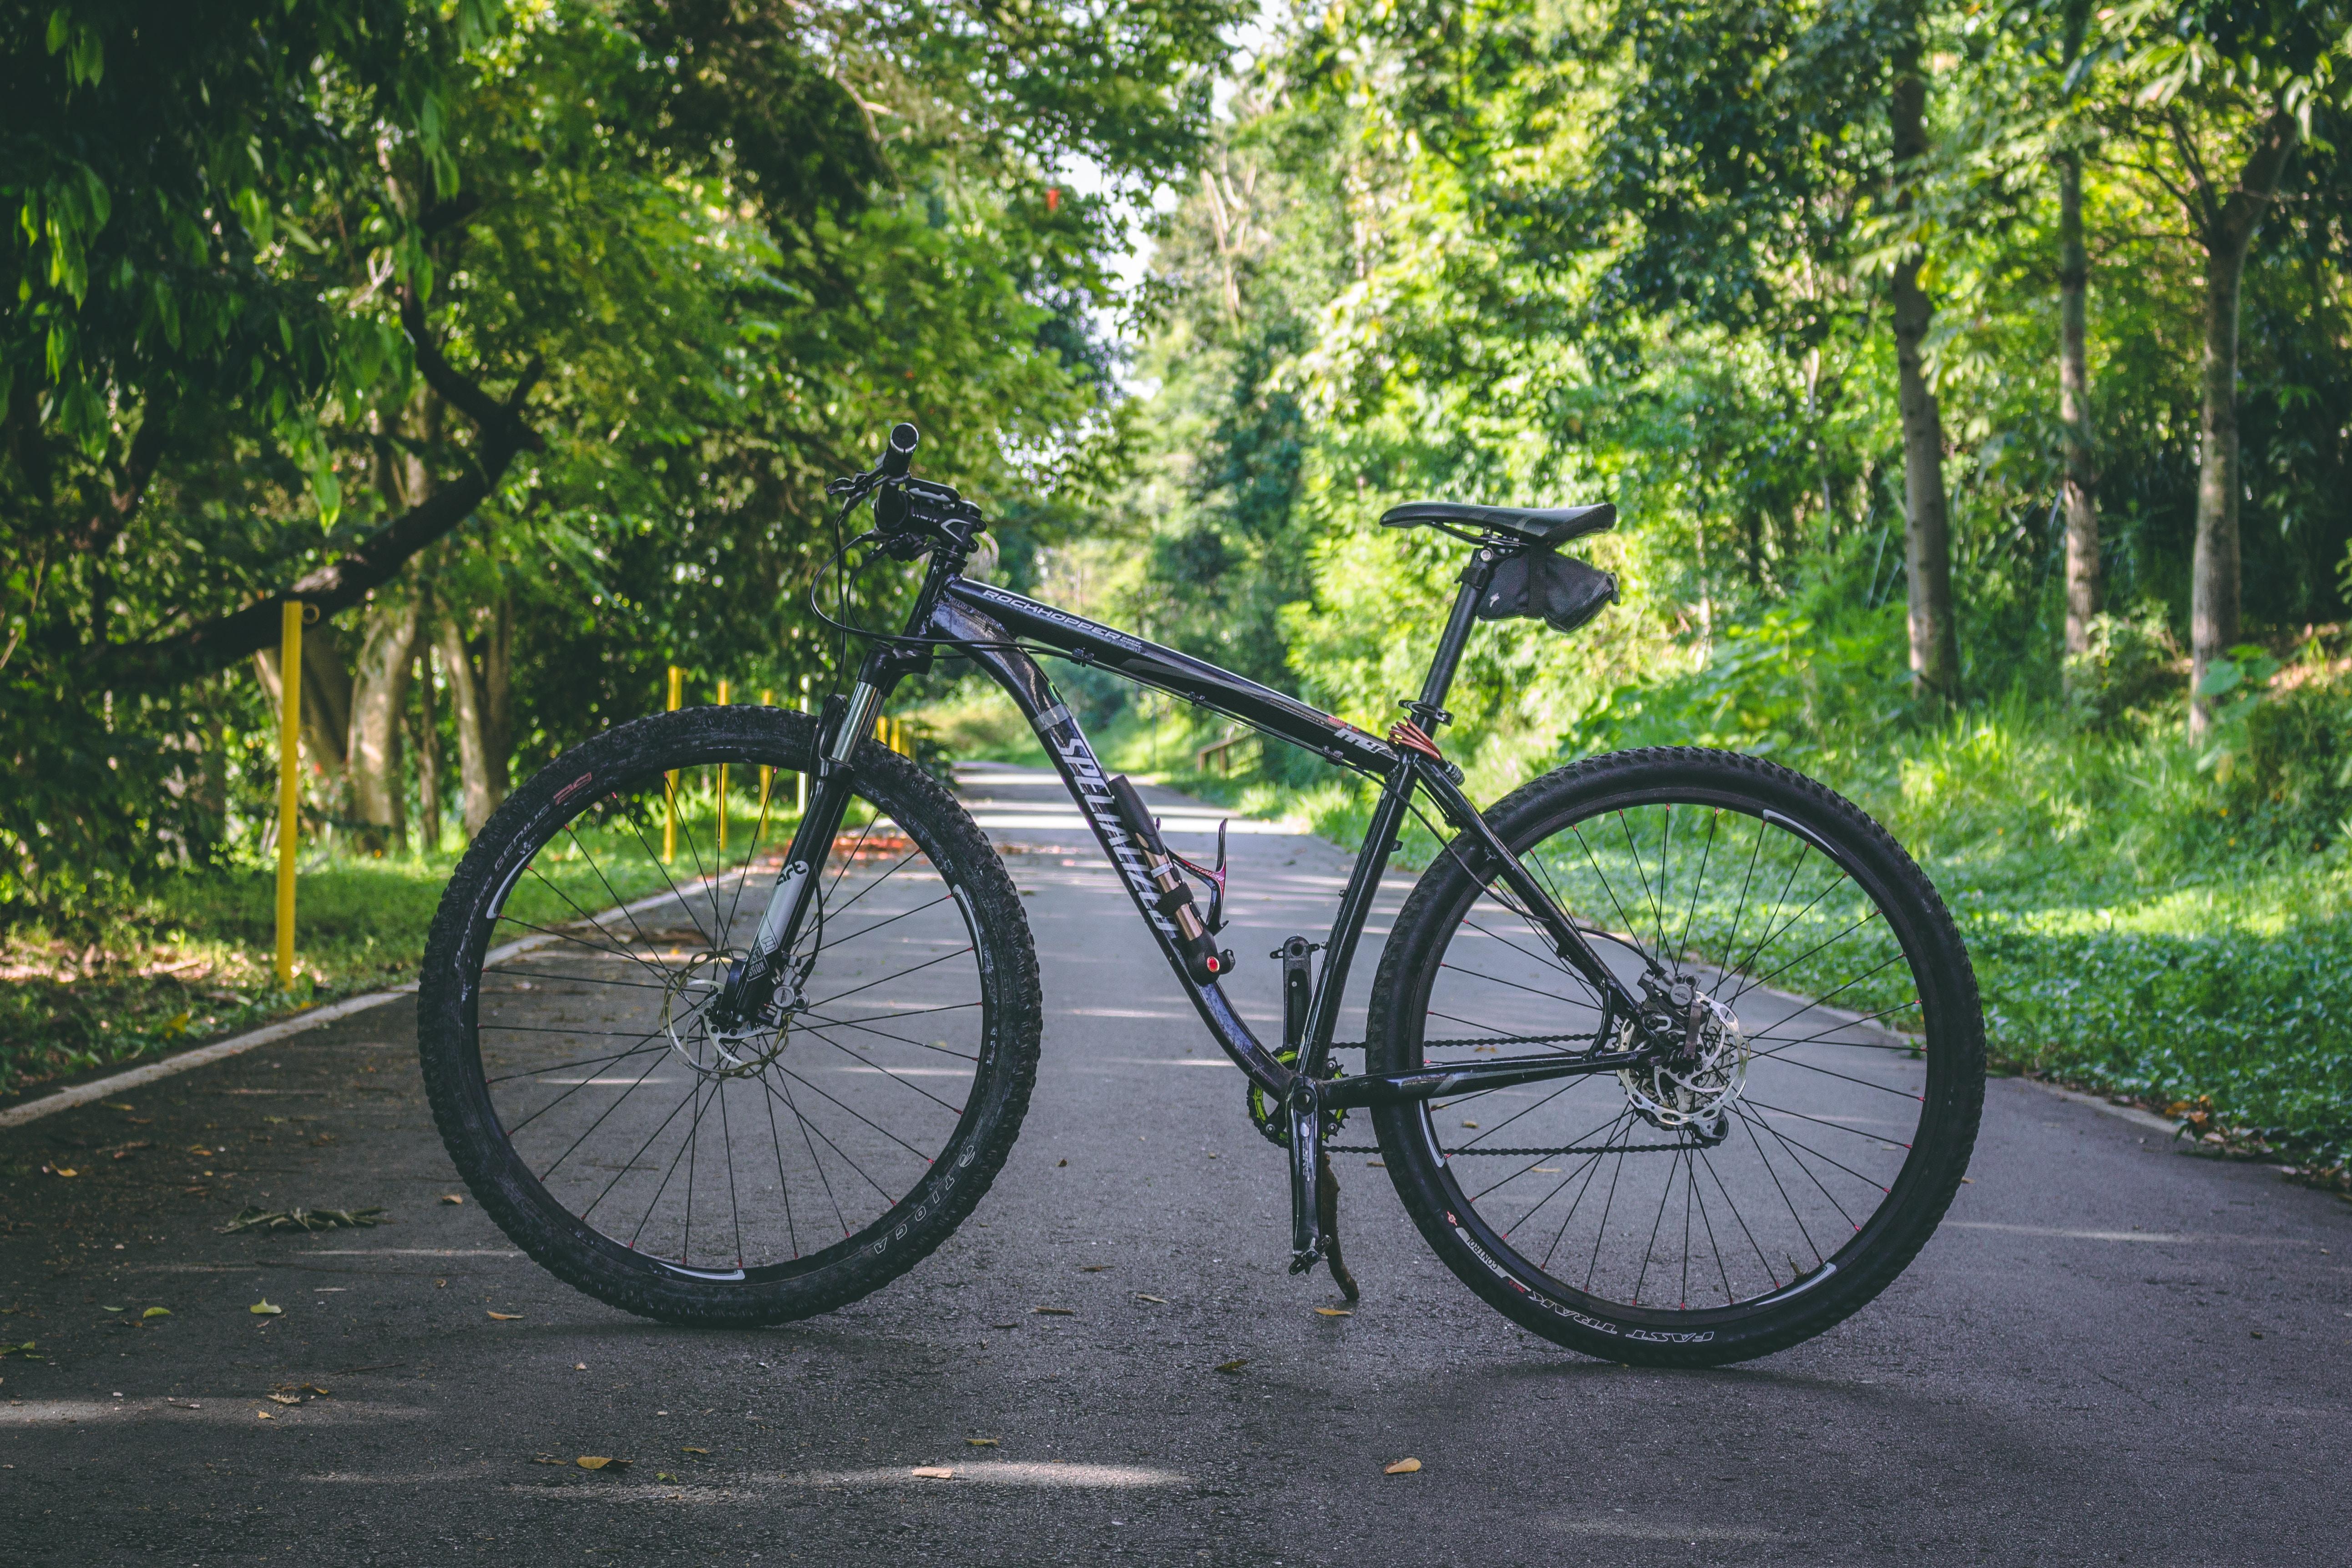 black hardtail bike on road